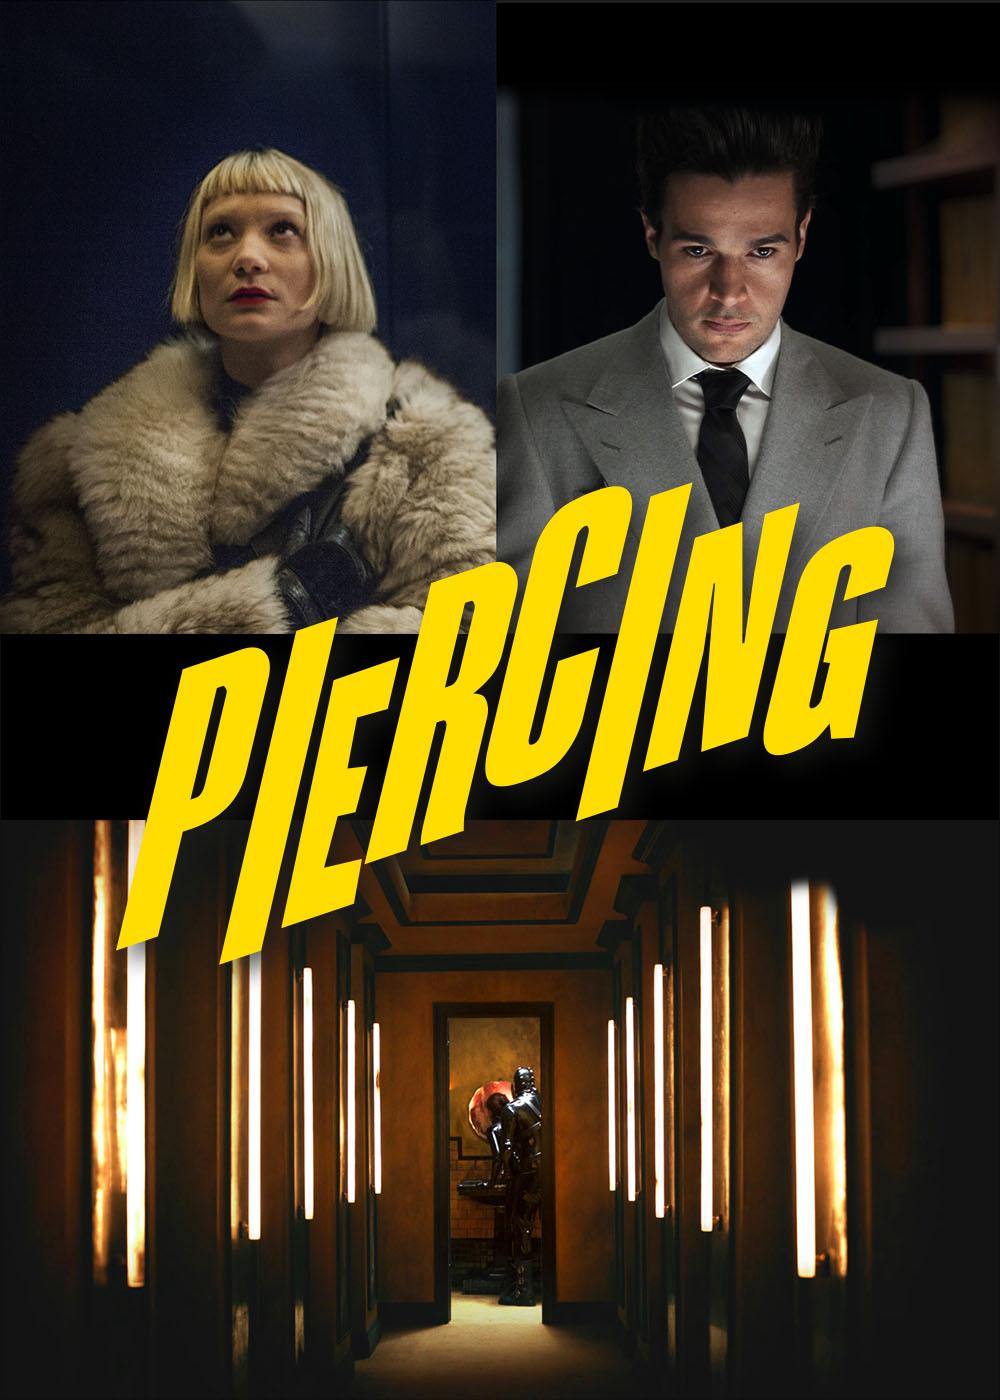 piercing_poster.jpg